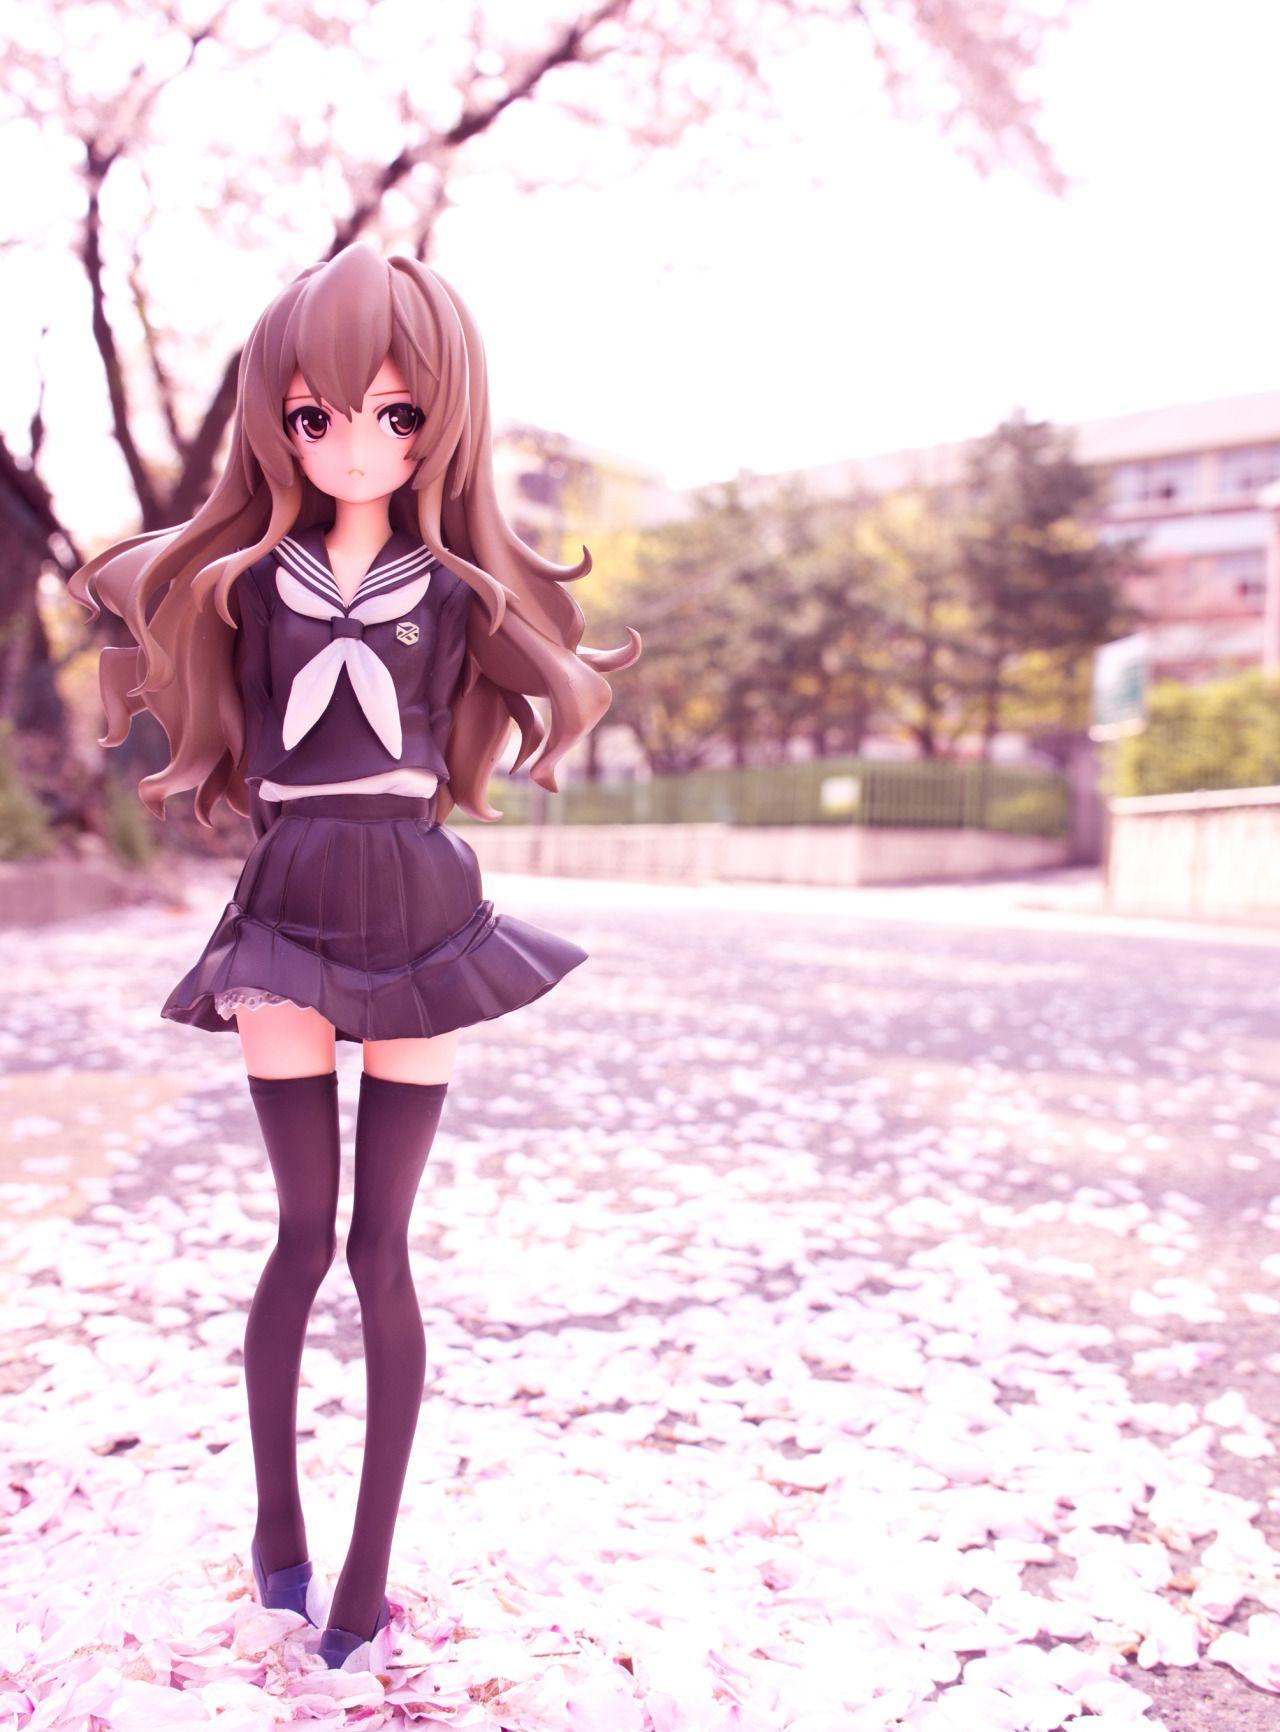 Taiga Aisaka ♡ Anime figures, Anime figurines, Toradora